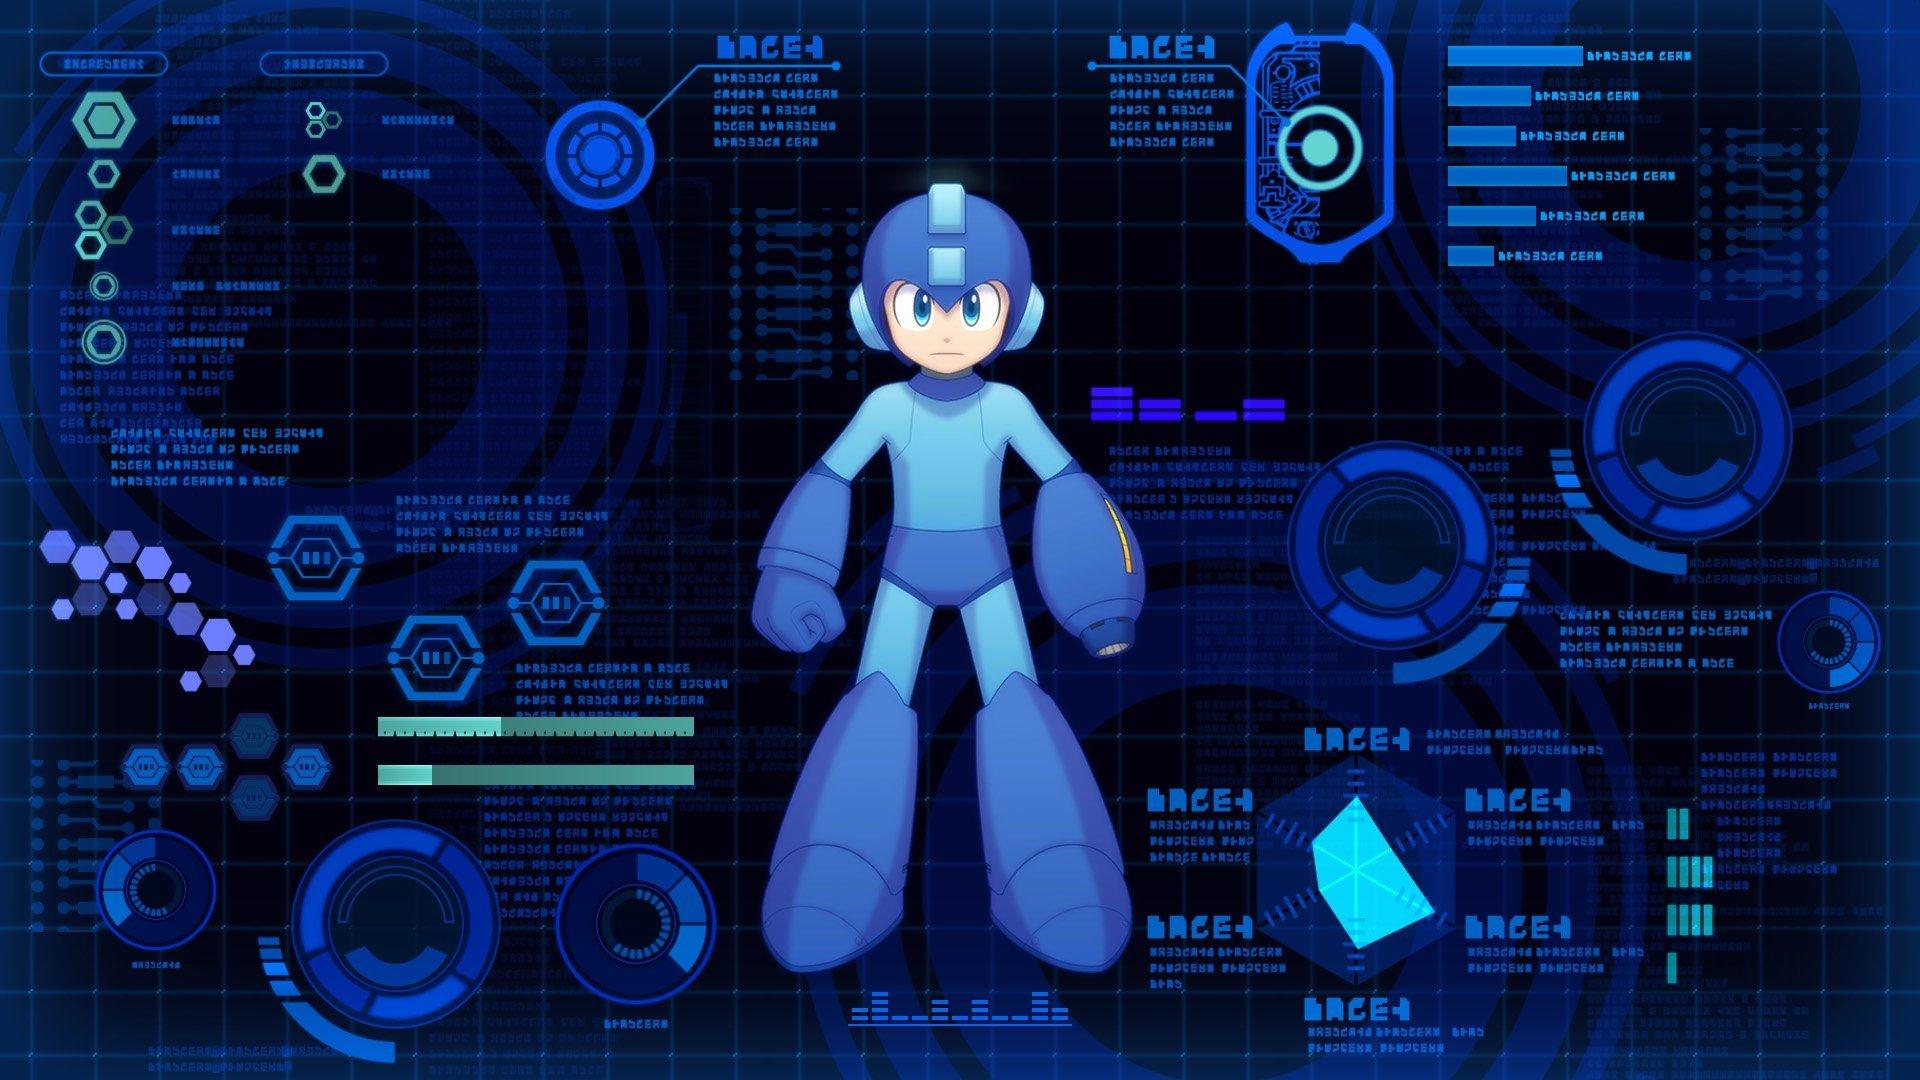 b7f632e2e45 Capcom Brings Mega Man 11 and Monster Hunter Generations to E3 2018 ...